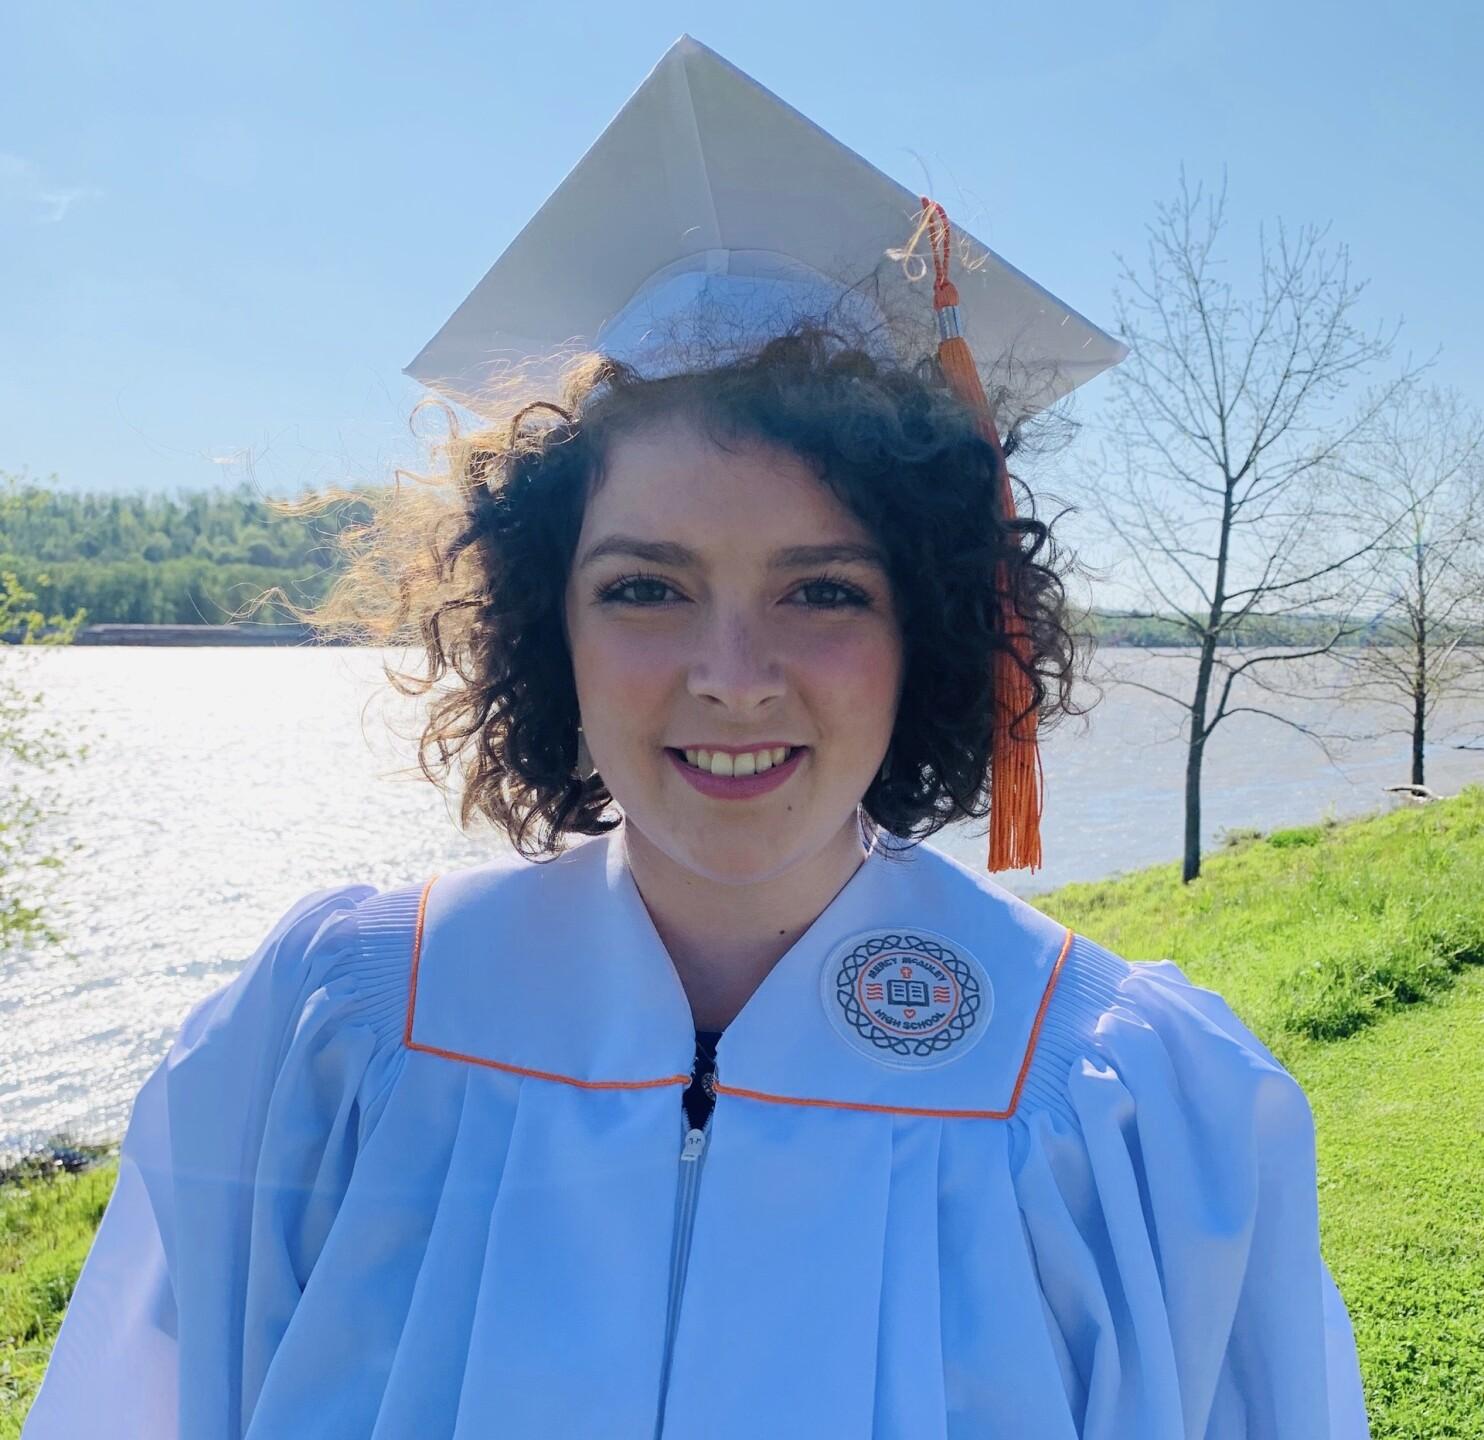 Erin Toon, Mercy McAuley High School